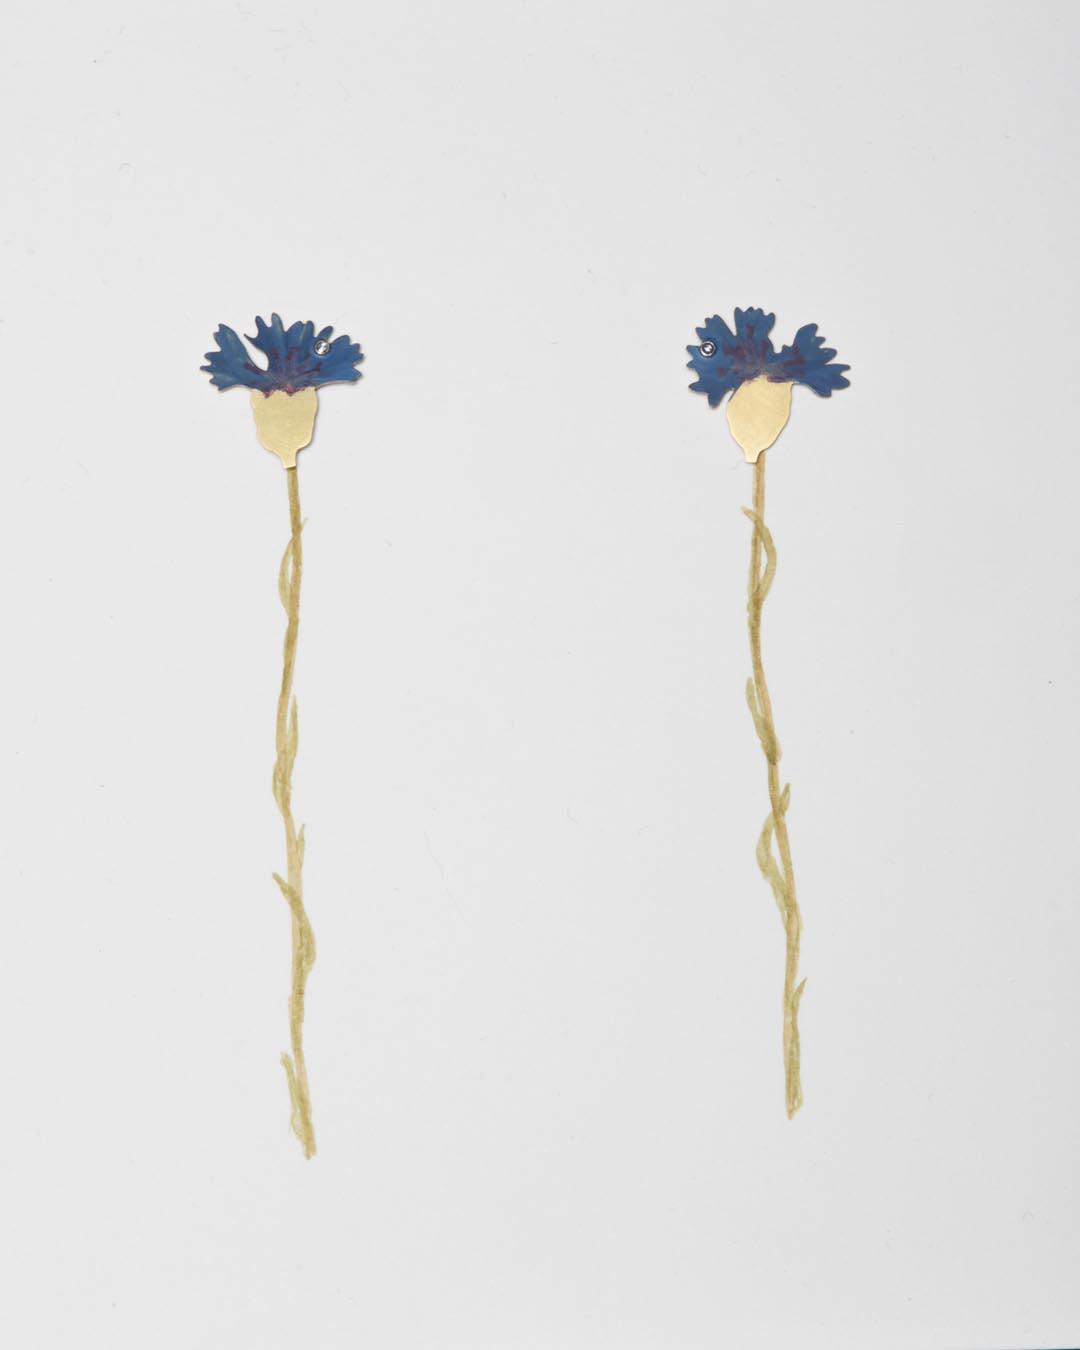 Christopher Thompson Royds, Natura Morta: cornflowers, 2019, stud earrings; 18ct gold, hand-painted, diamonds, 20 x 20 mm, €1150 (image 2/2)